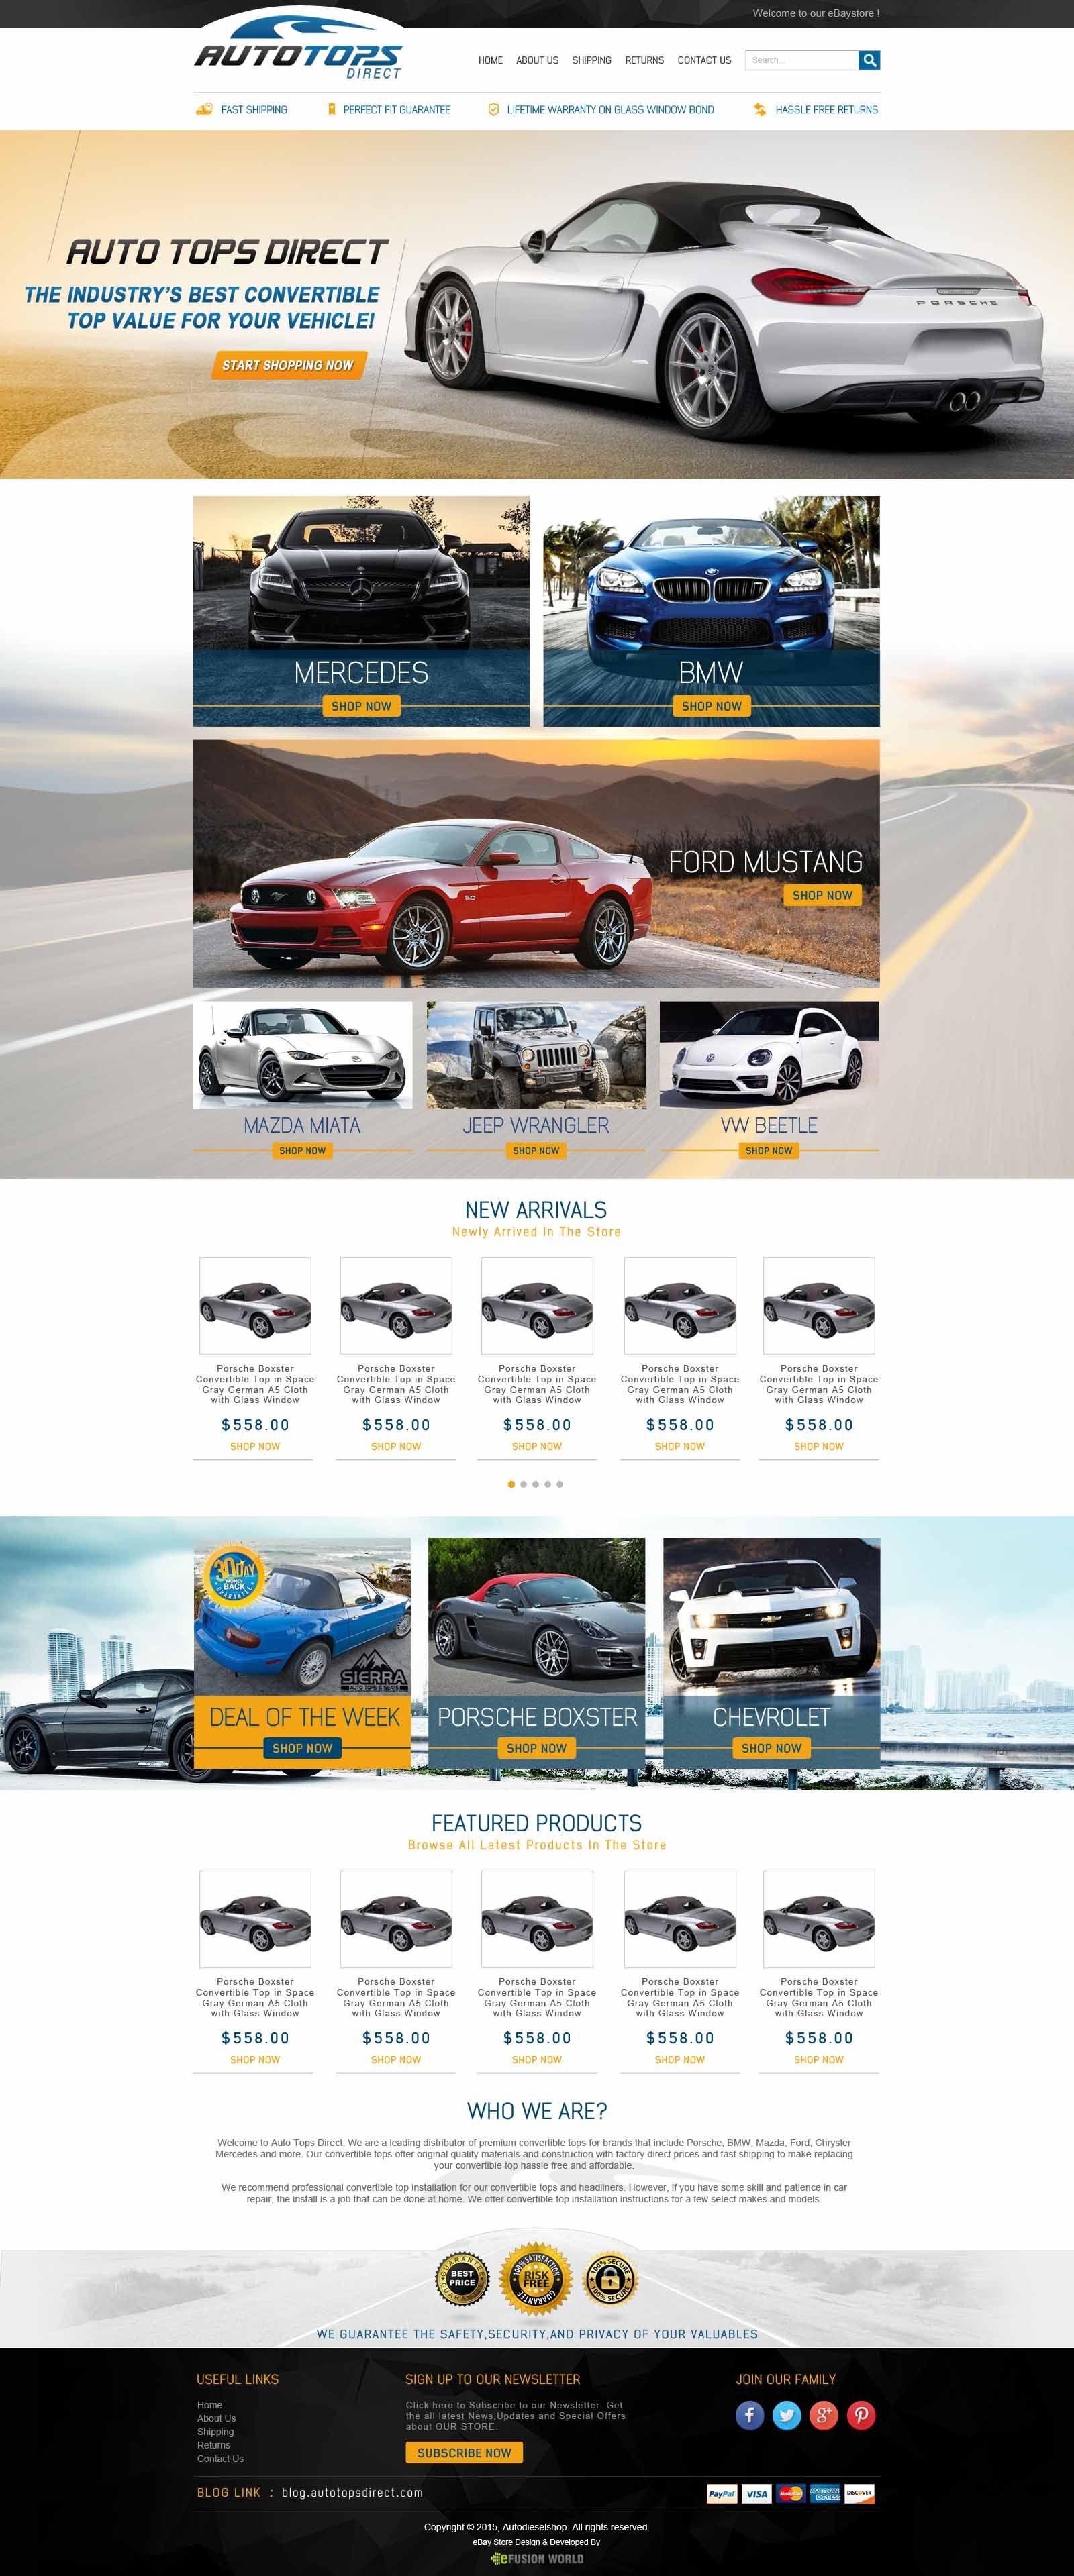 EFusionWorld Deliver Very Much Innovational And Custom EBay Store - Custom ebay store design template